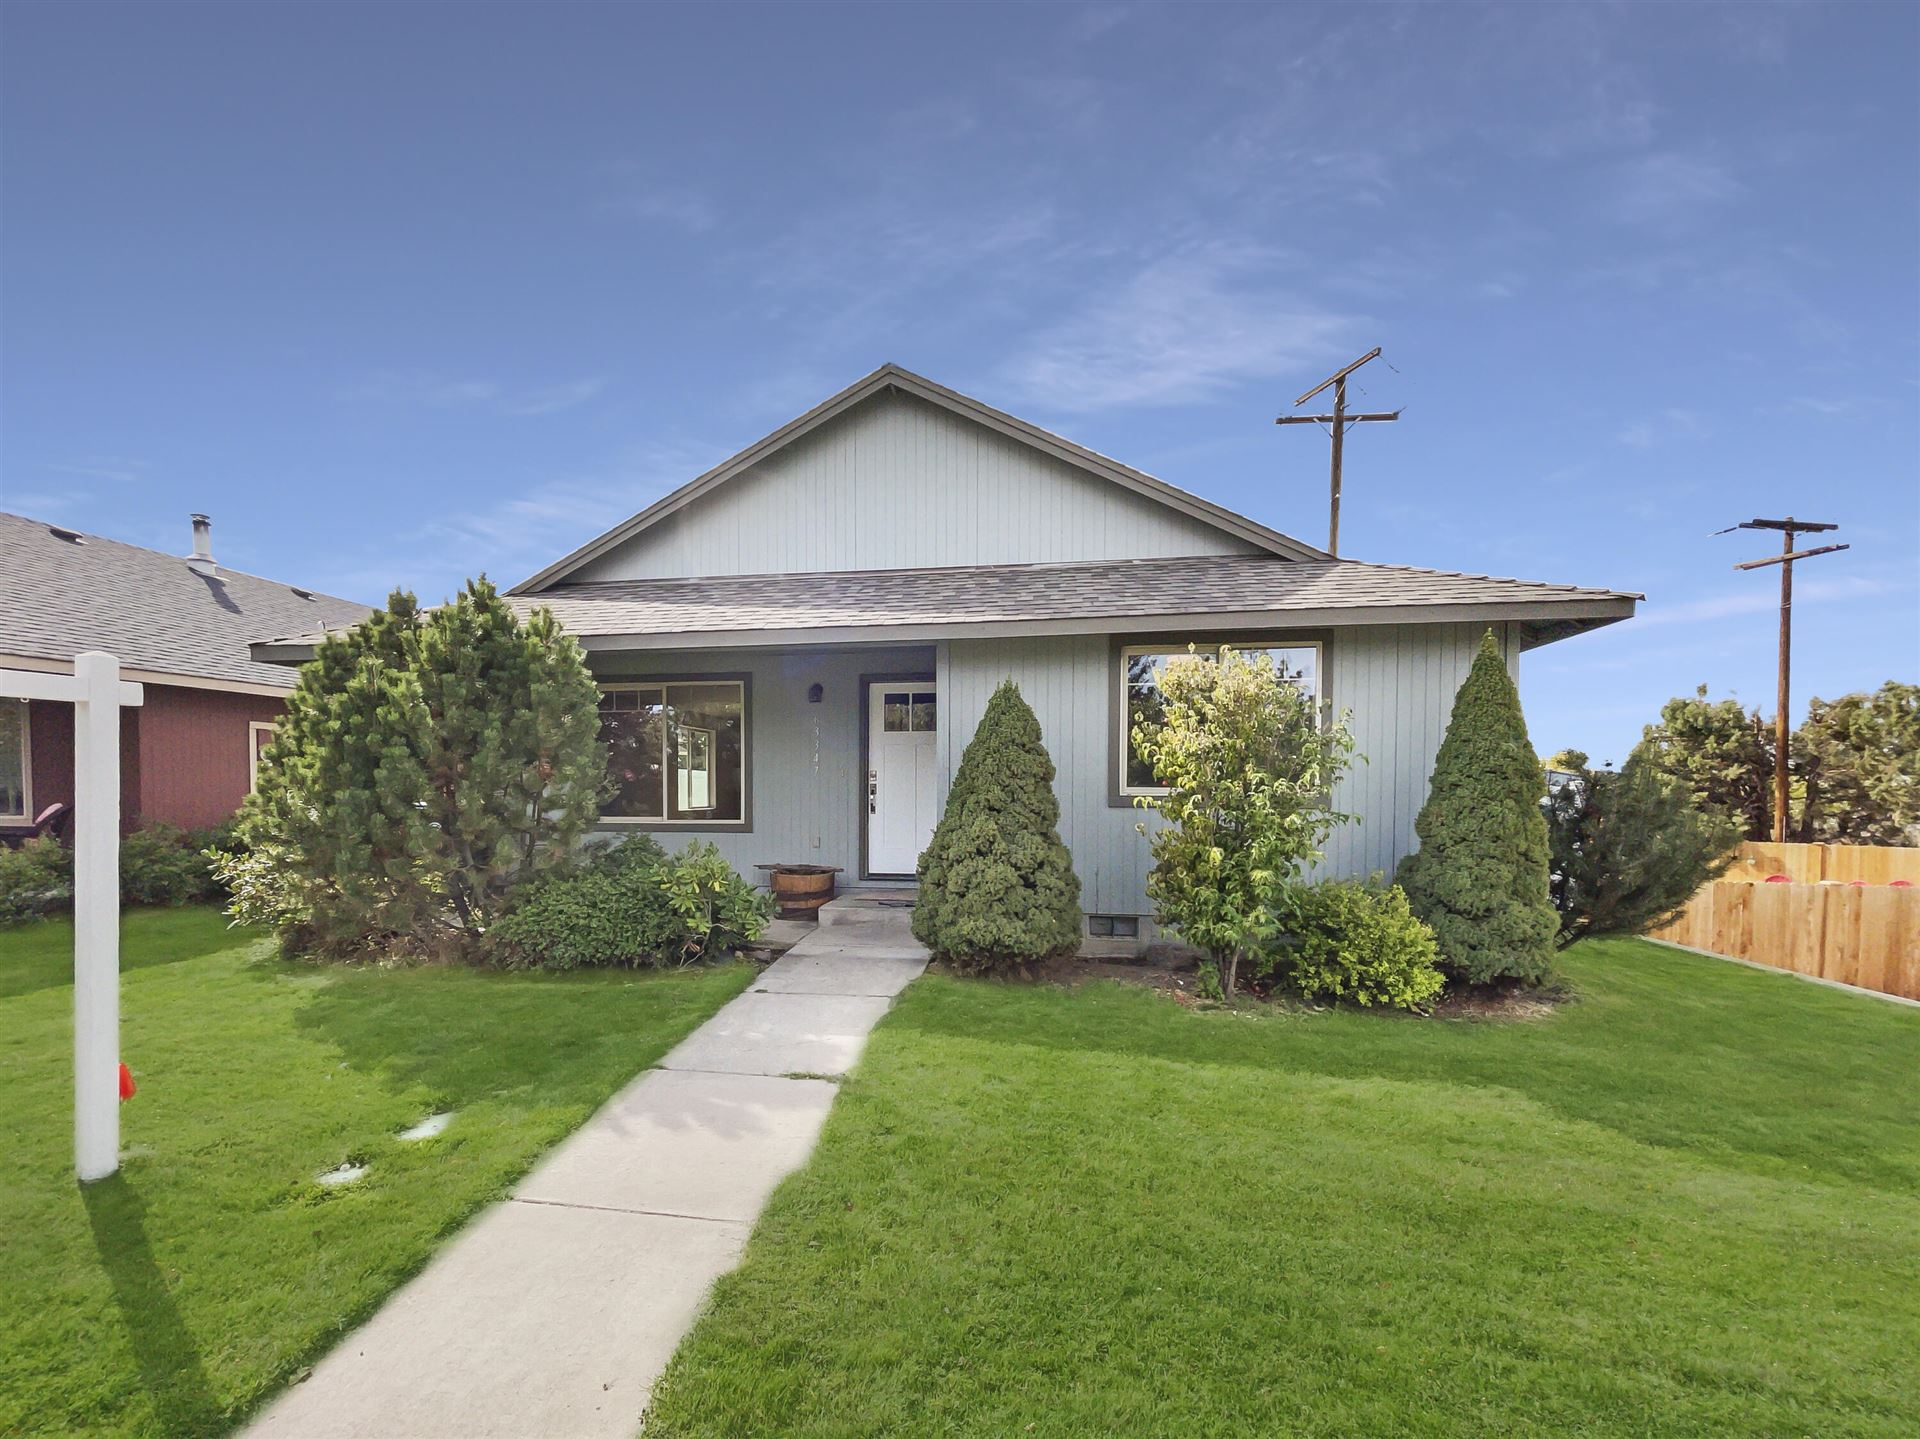 Photo of 63347 Vogt Road, Bend, OR 97701 (MLS # 220132054)